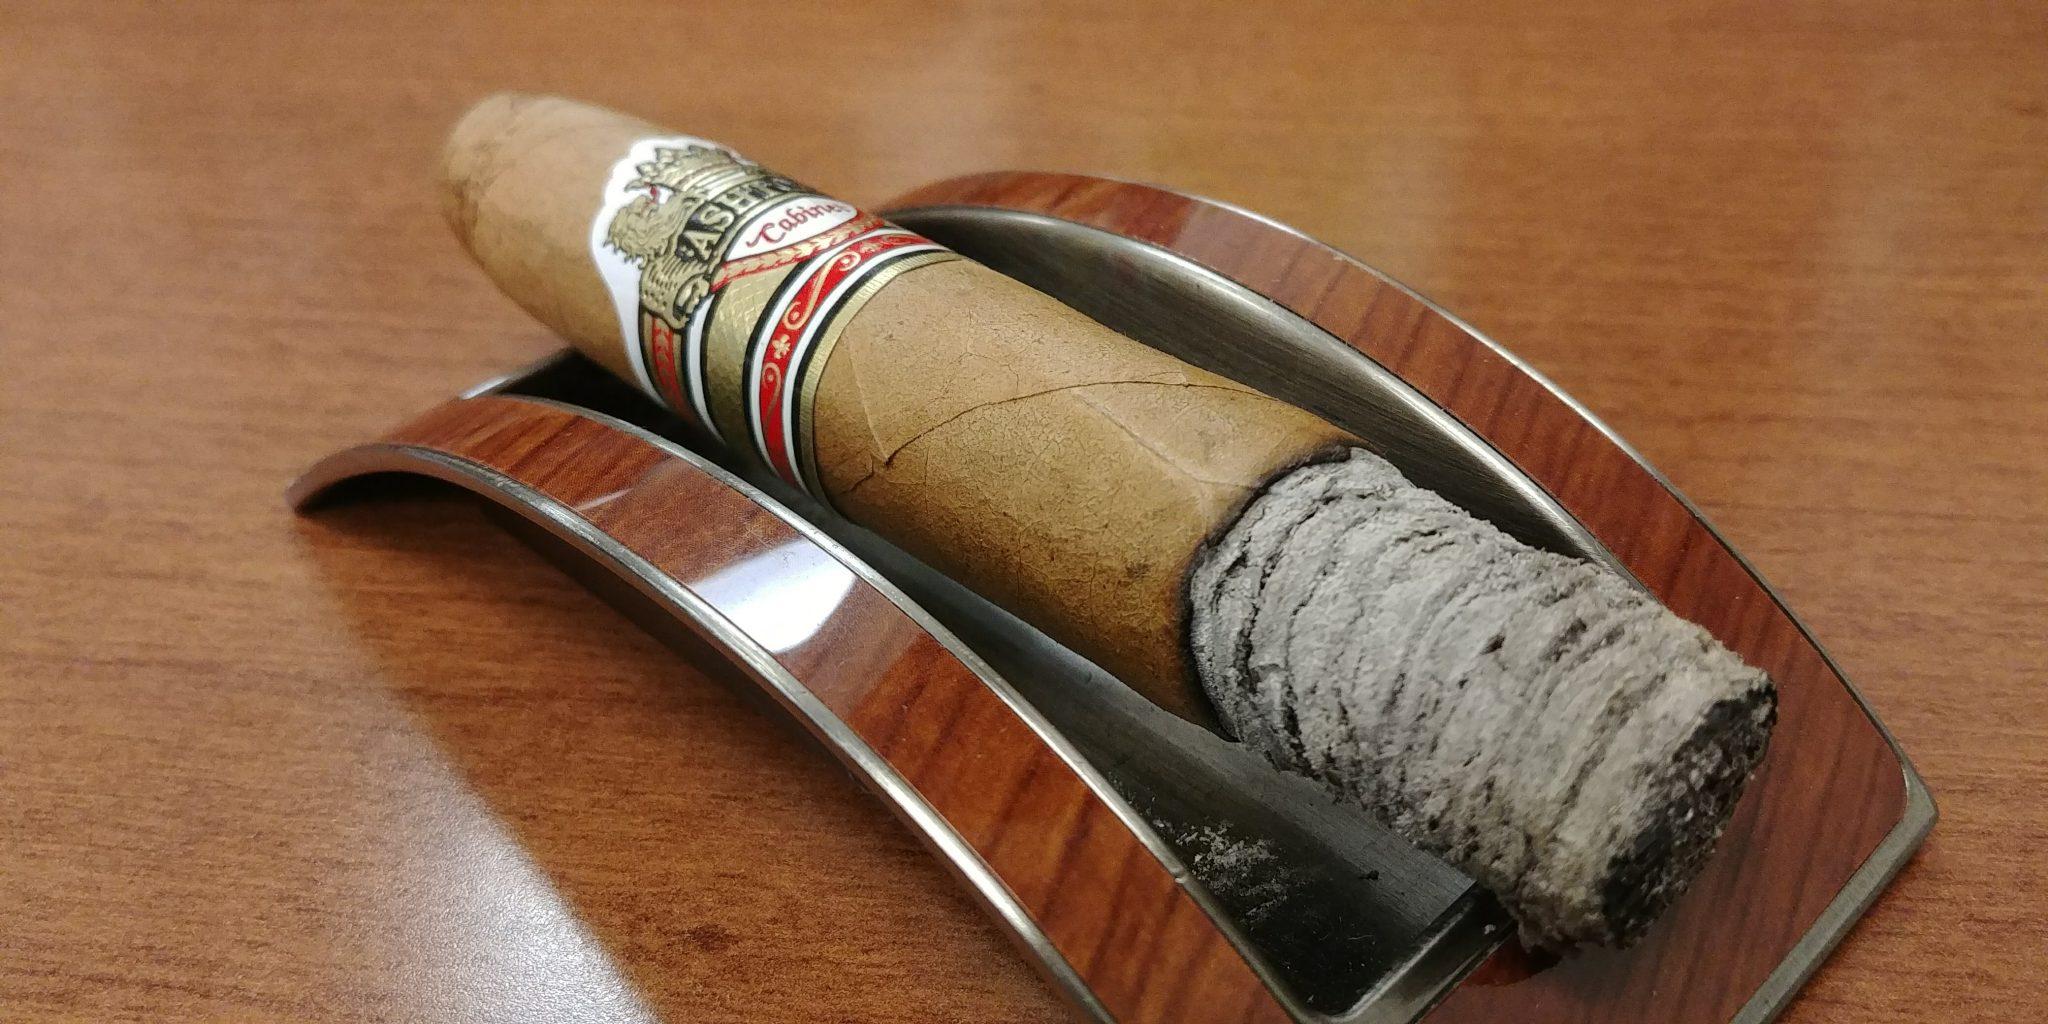 ashton cigars guide ashton cabinet cigar review jp